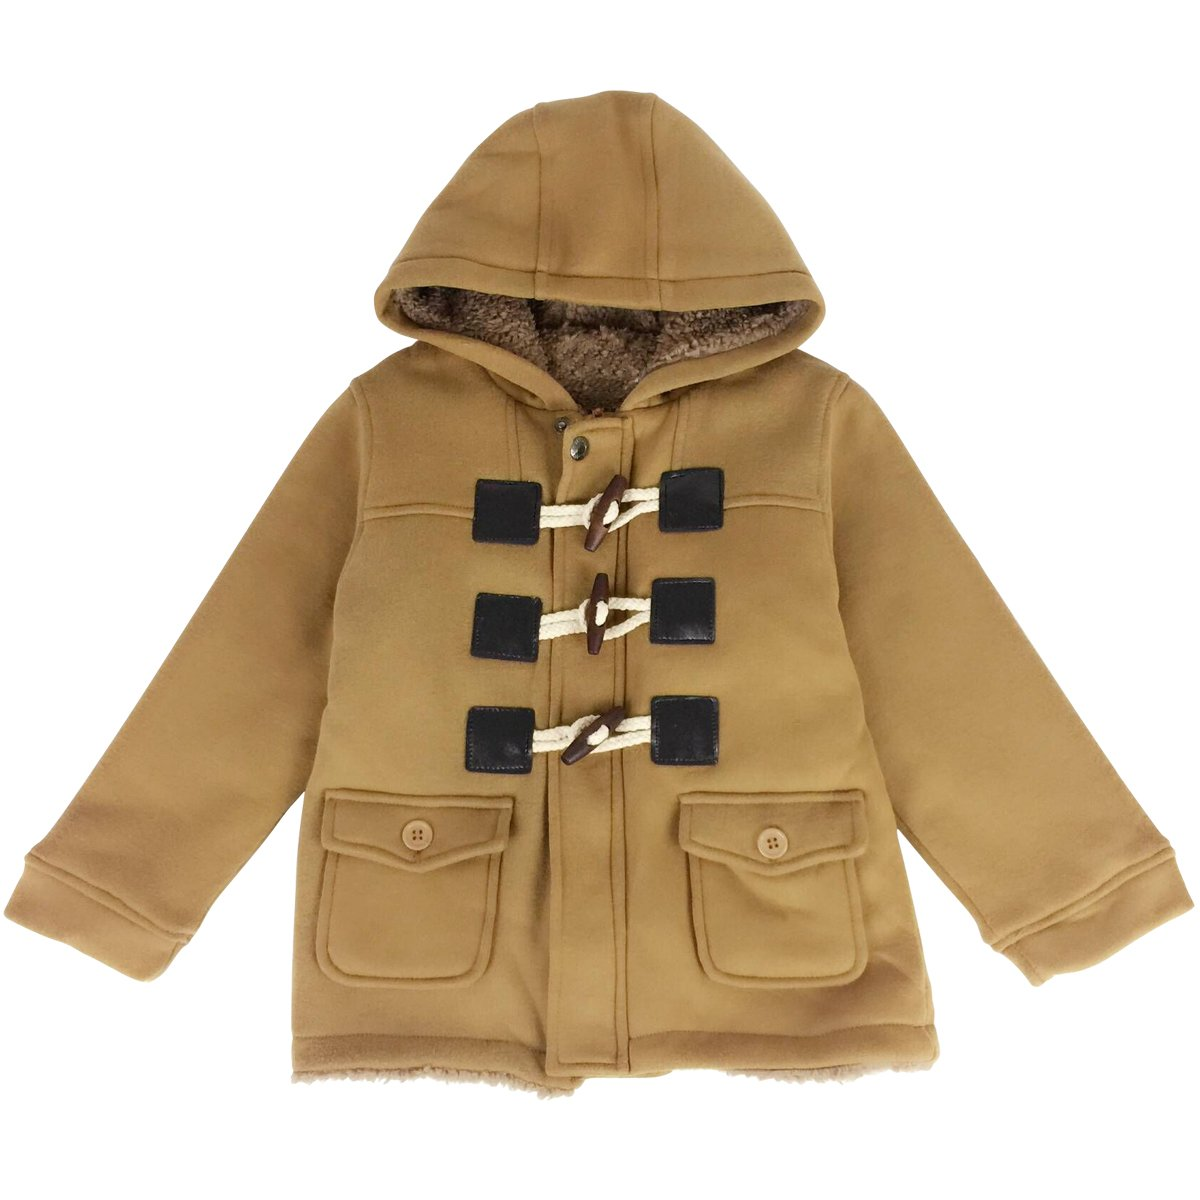 08c67a2d3 Amazon.com  Jastore Unisex Baby Boys Girls Winter Warm Hooded Coat ...